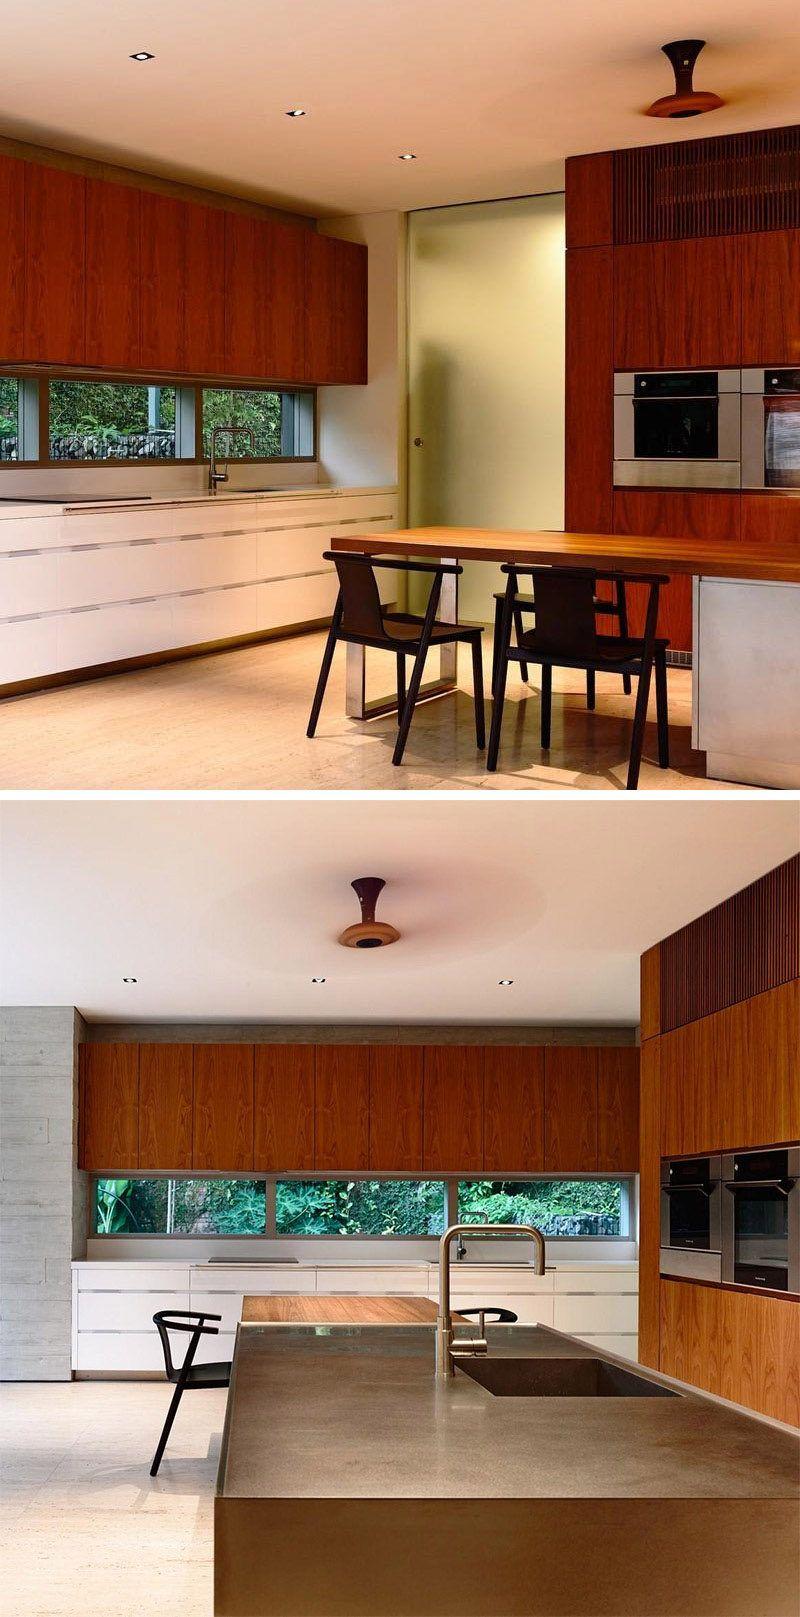 Interior Design Ideas Hide The Air Conditioning Unit Inside A Cabinet Interior Design Interior Green Dining Room